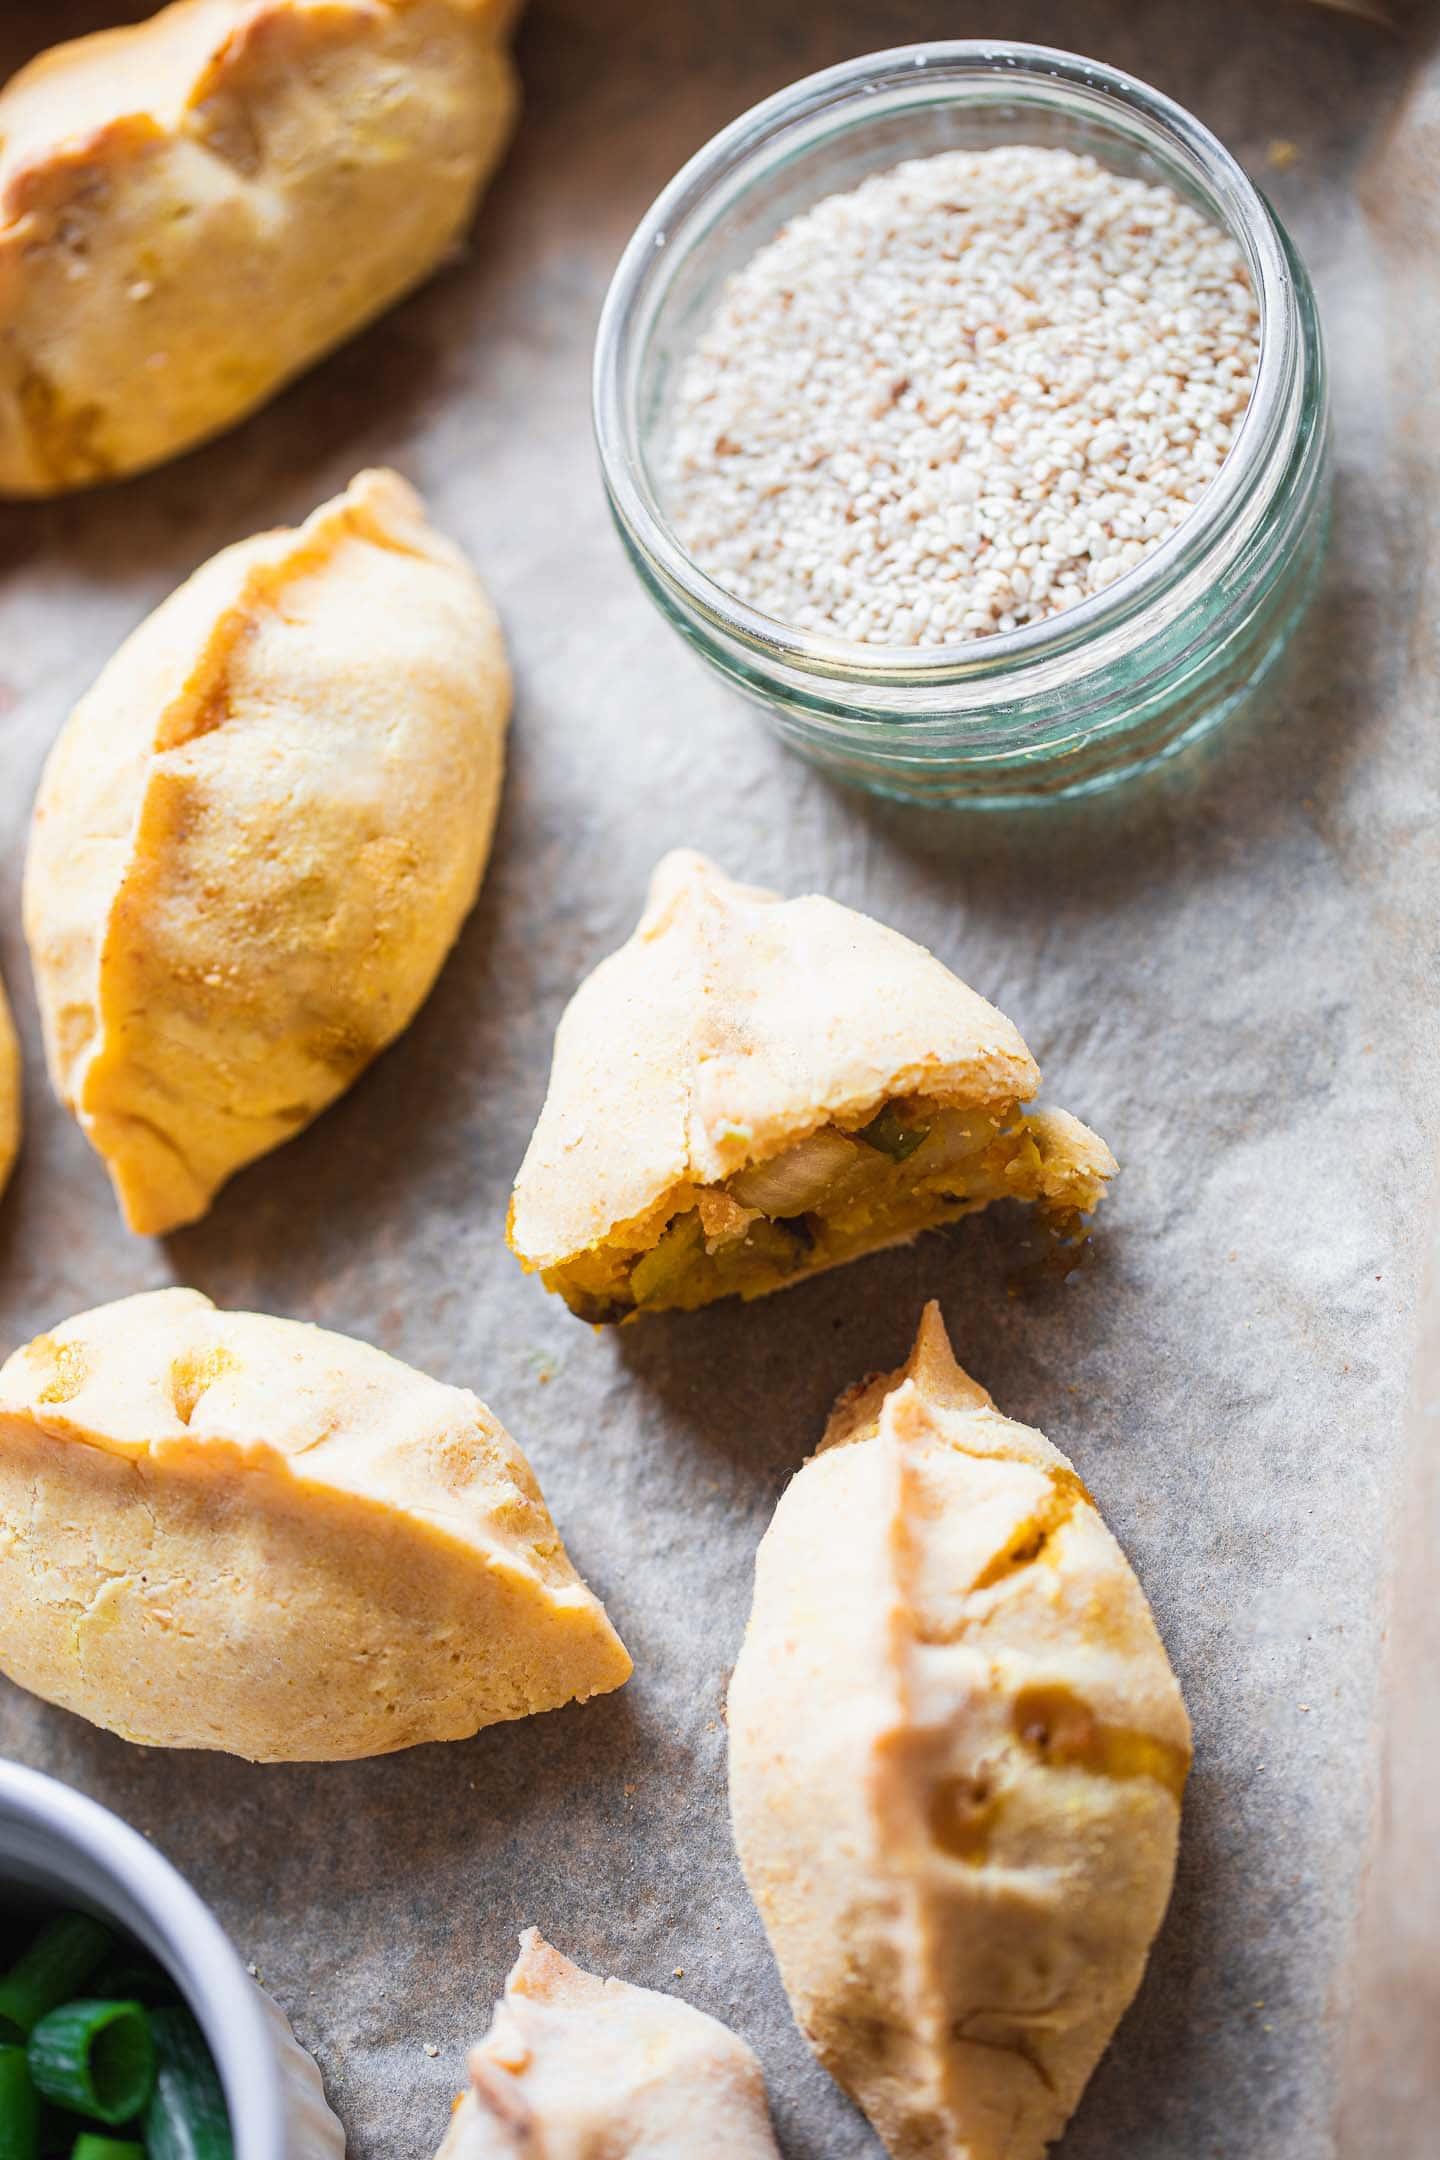 Gluten-free vegan mushroom and potato piroshki